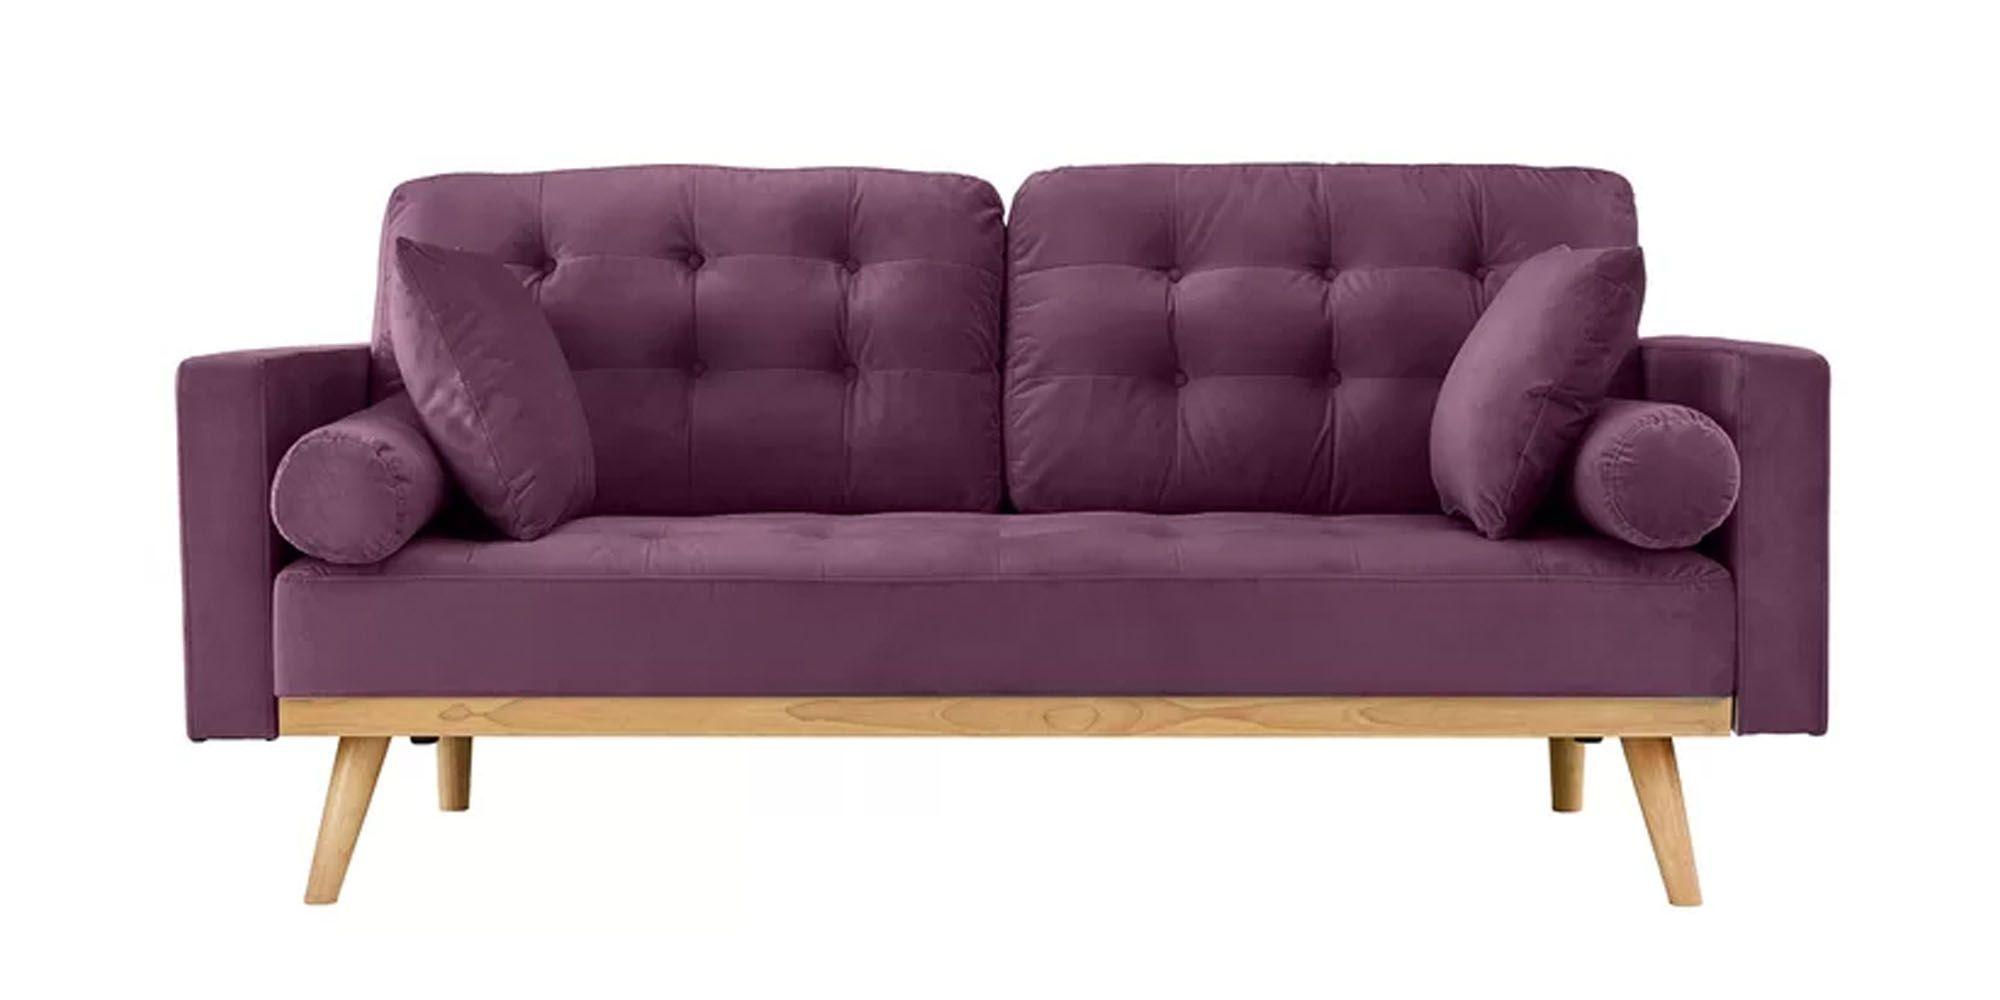 Sofa Und Co Molteni C Designer Furniture Made In Italy